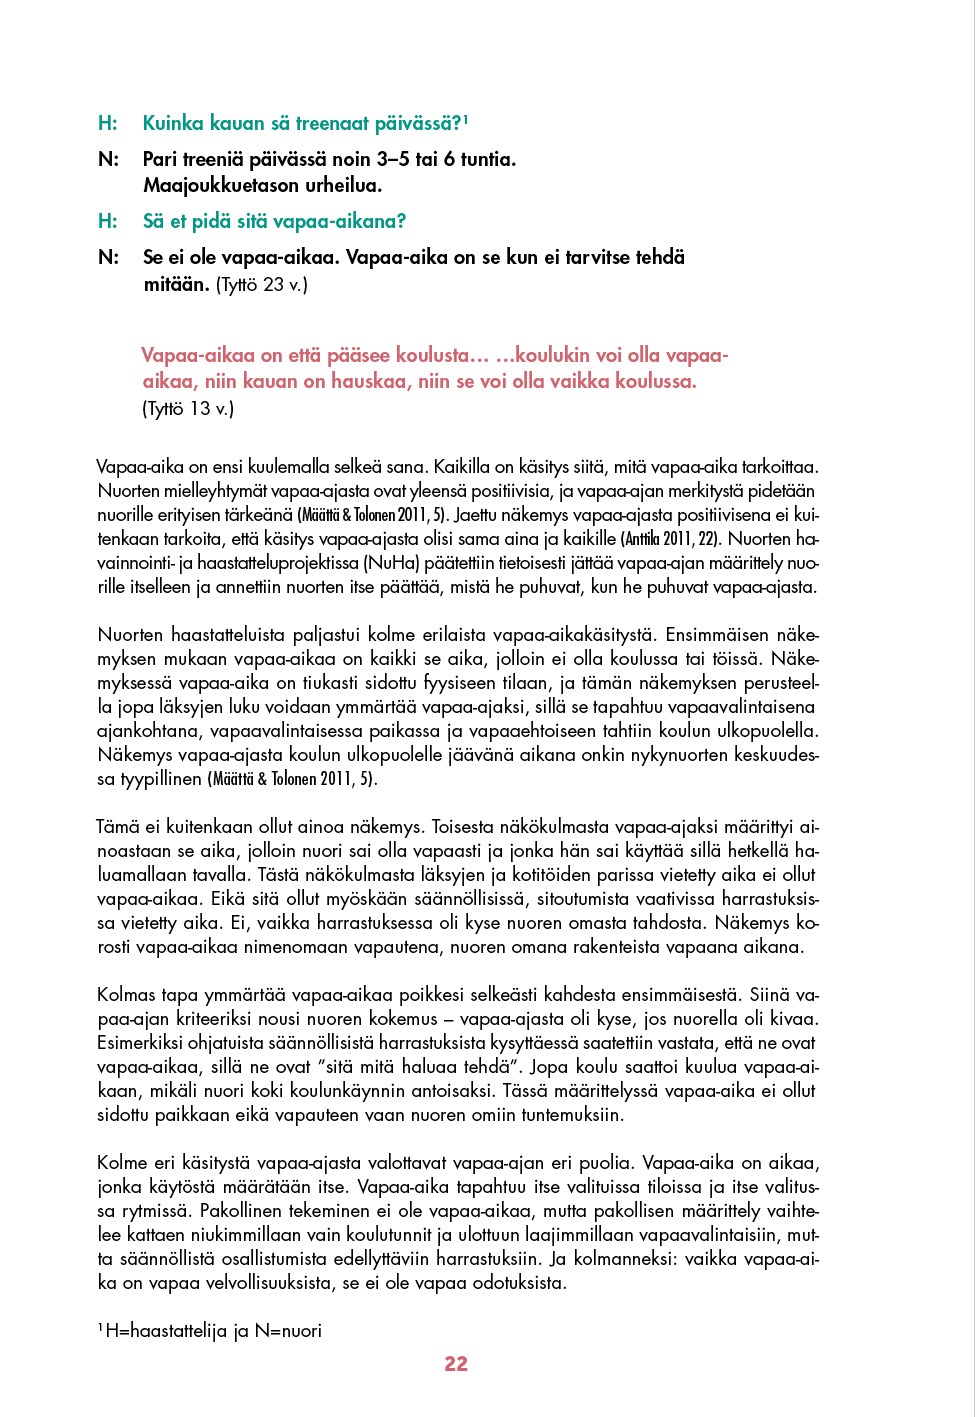 150330_NuHa_raportti_portfolioon_5